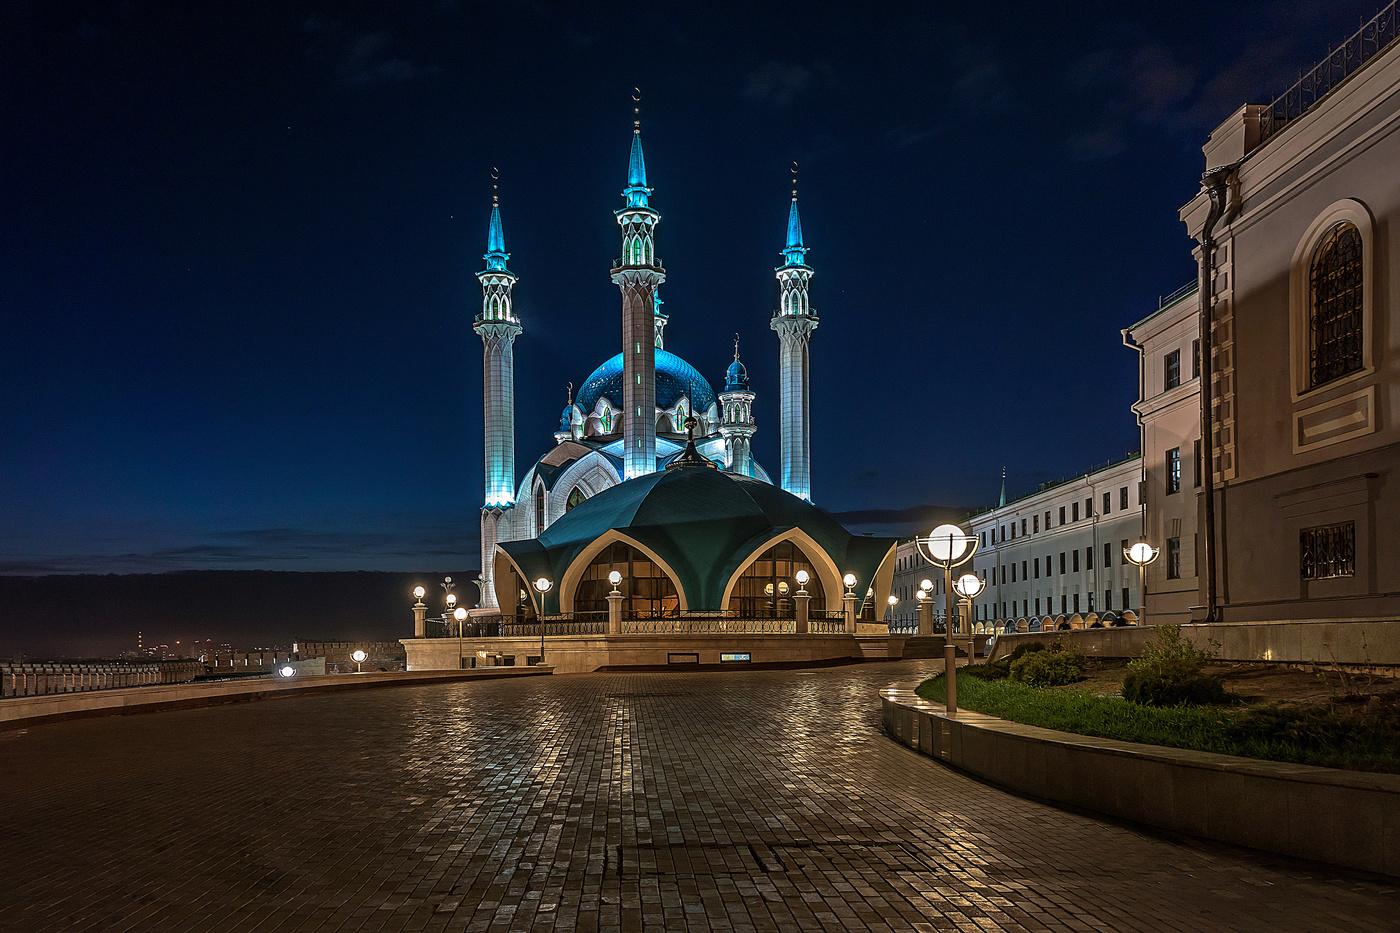 Картинки с мечетями